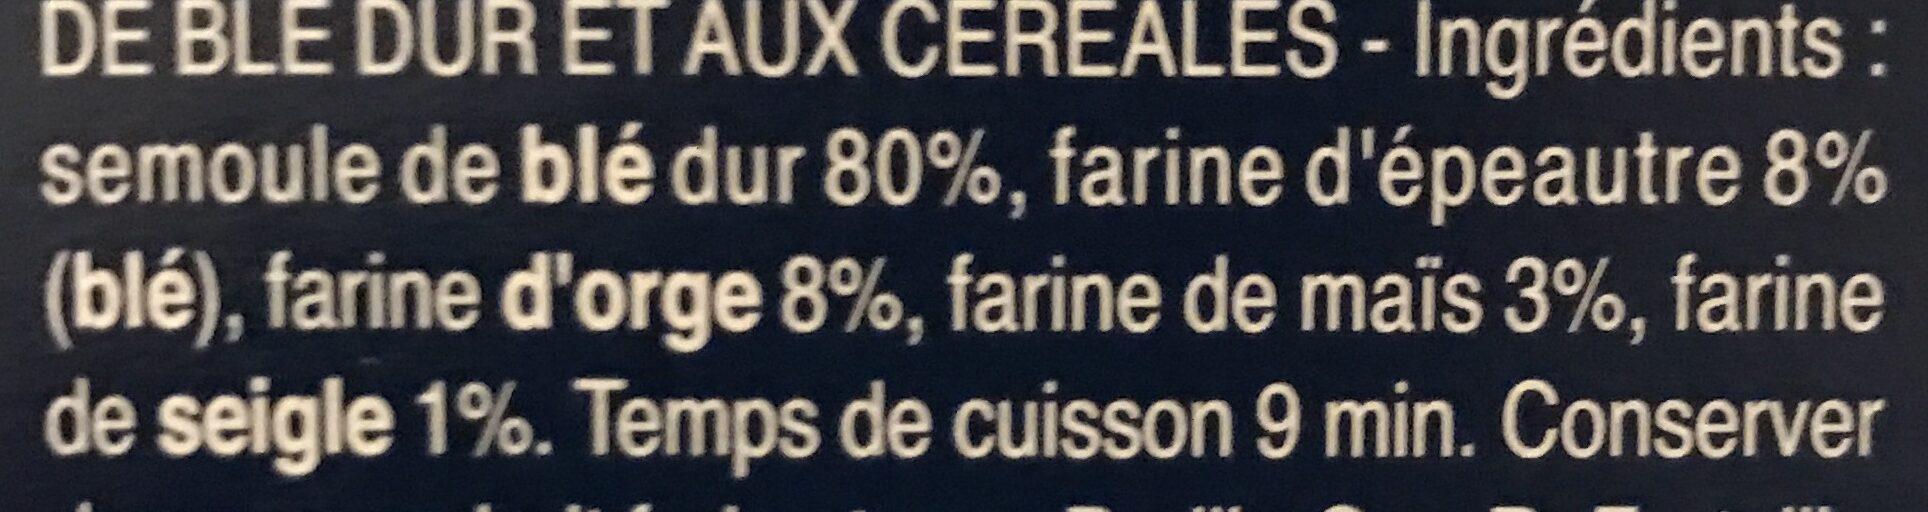 Penne Rigate 5 céréales - Ingredienti - fr